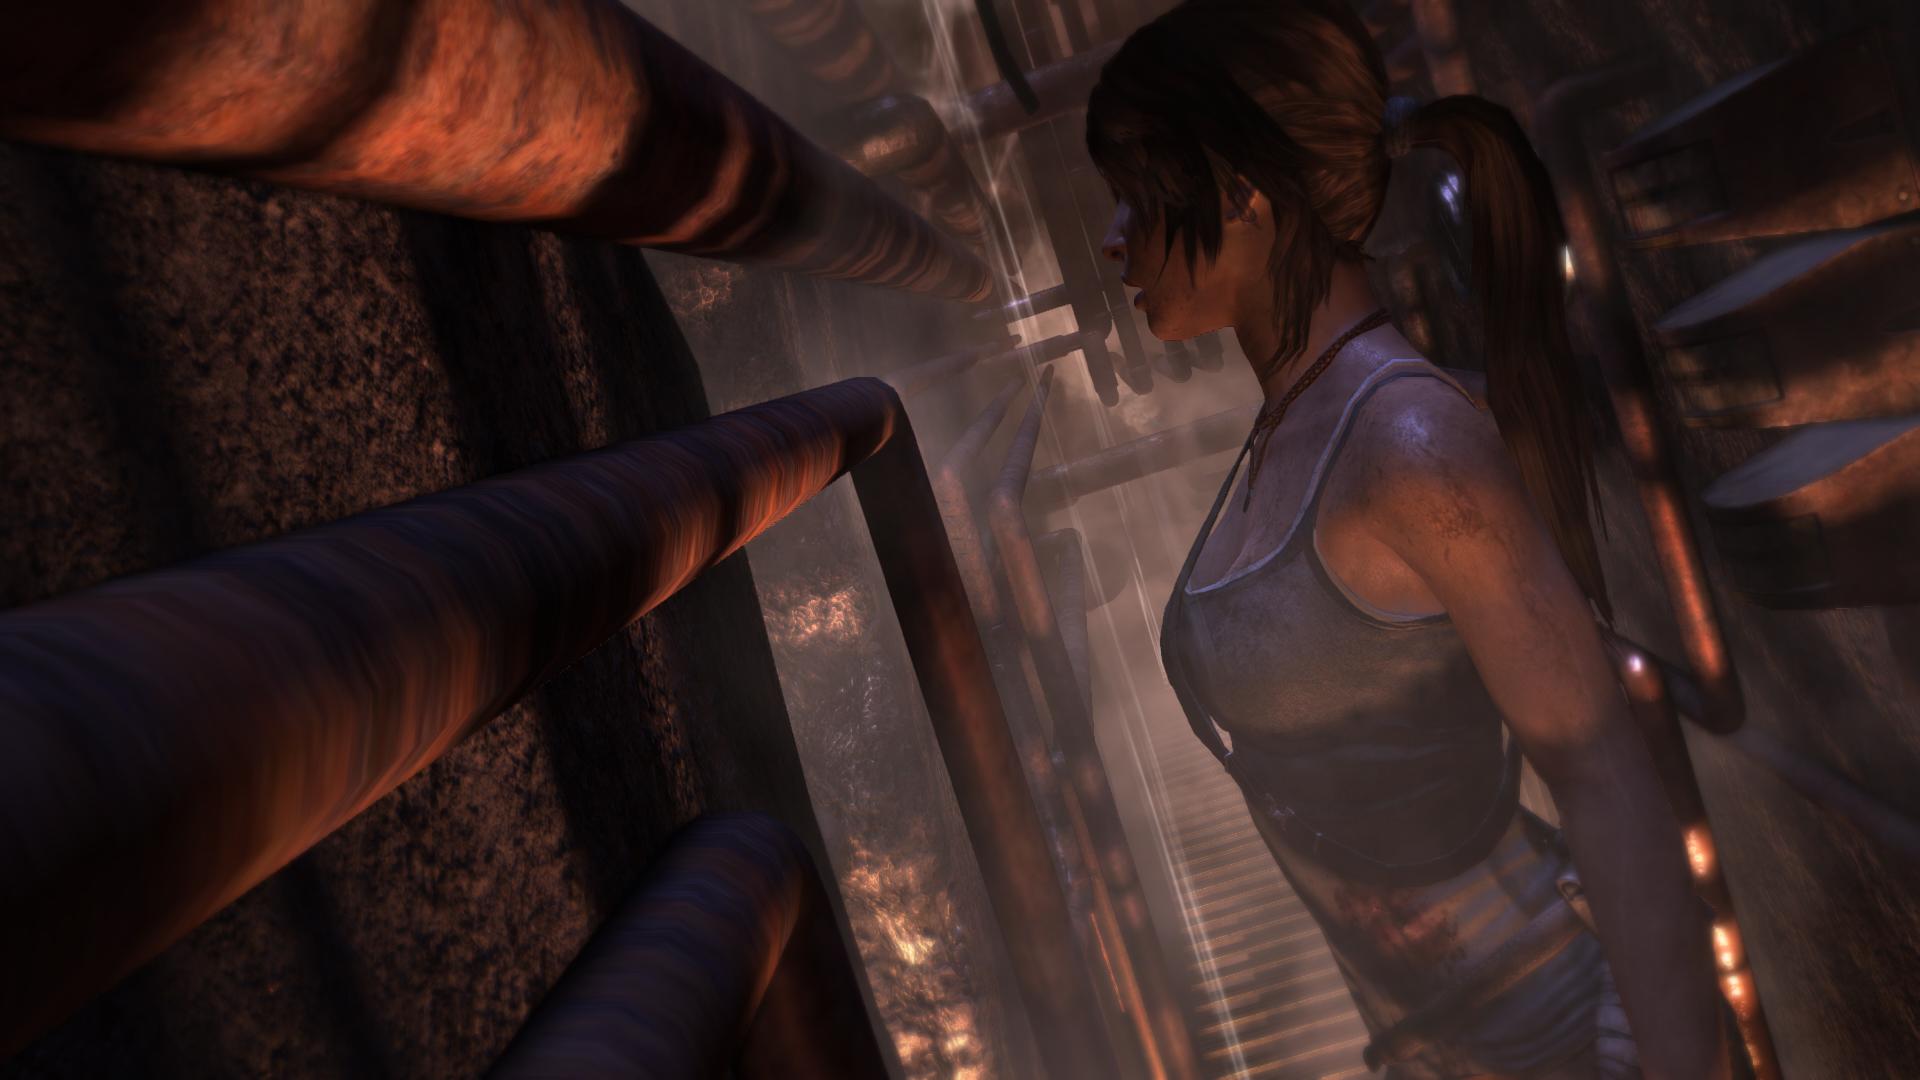 Lara croft gif xxx video